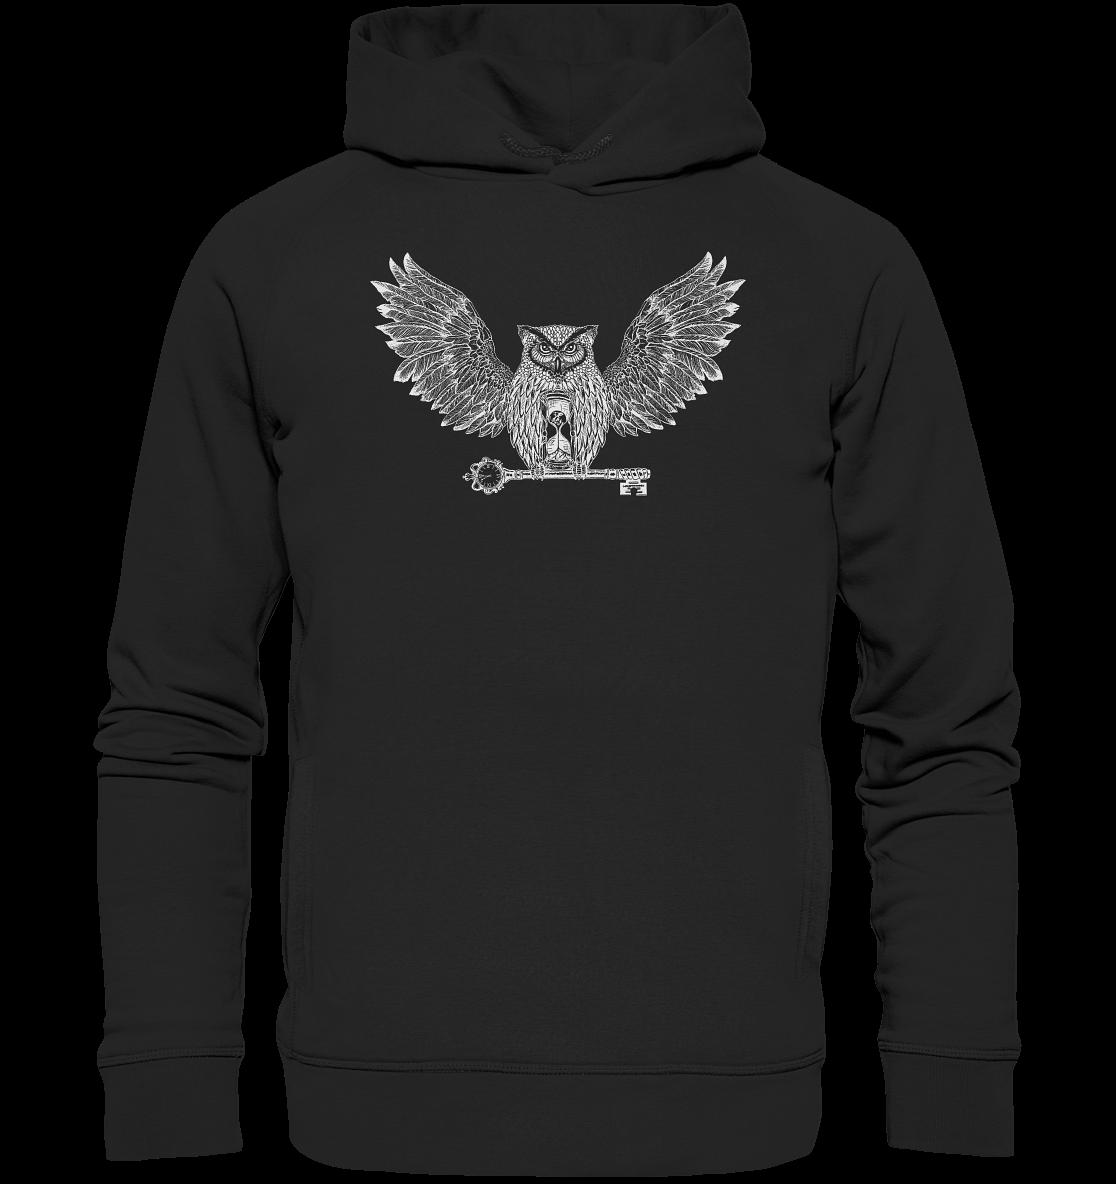 front-organic-fashion-hoodie-272727-1116x-4.png